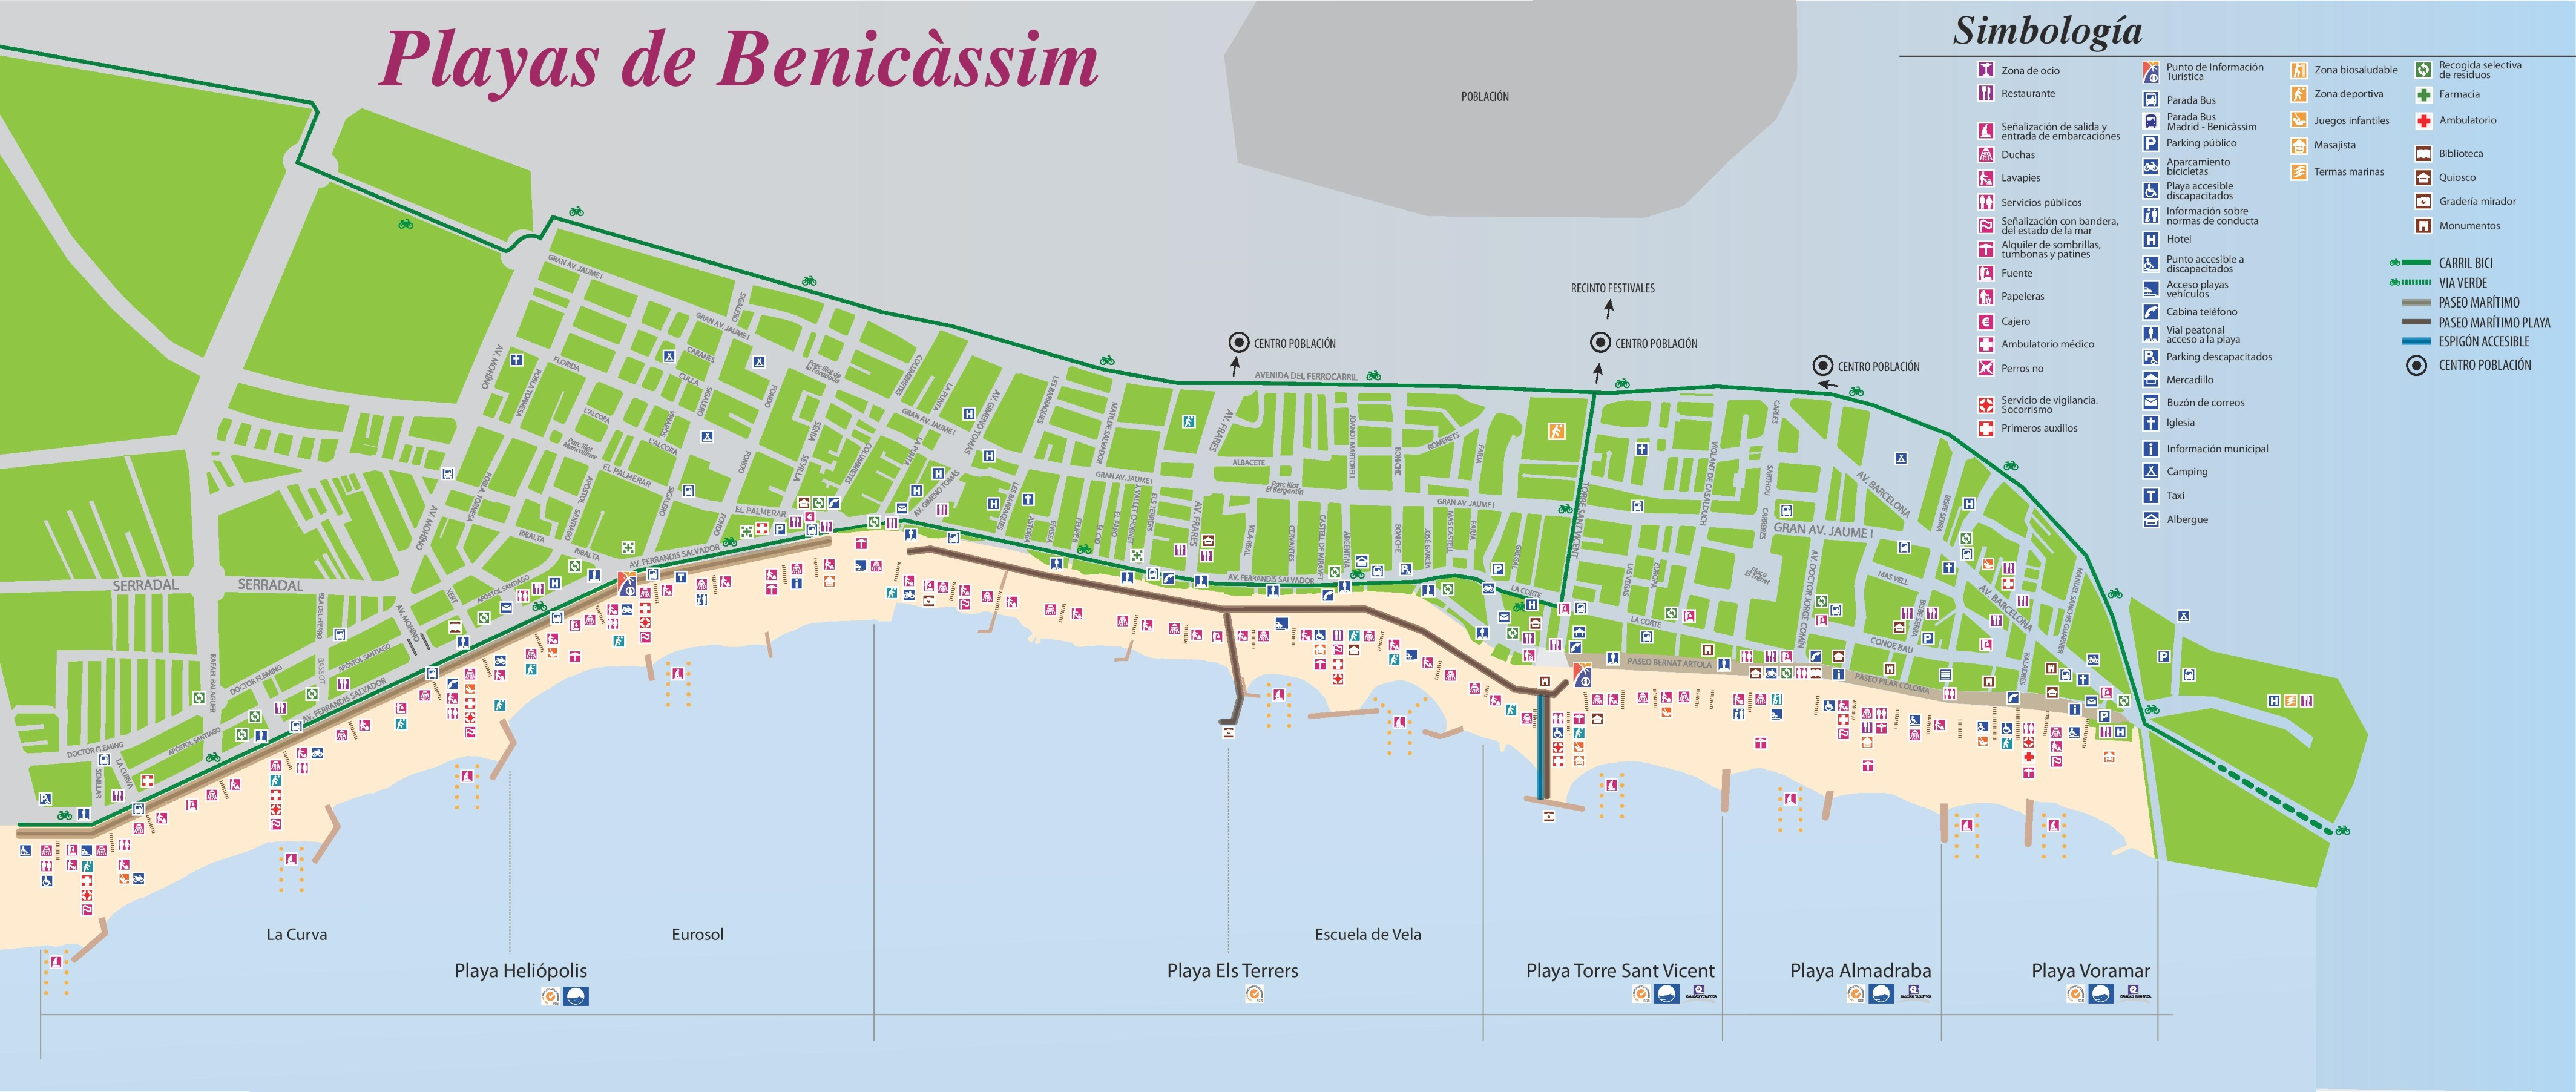 Benicssim tourist map